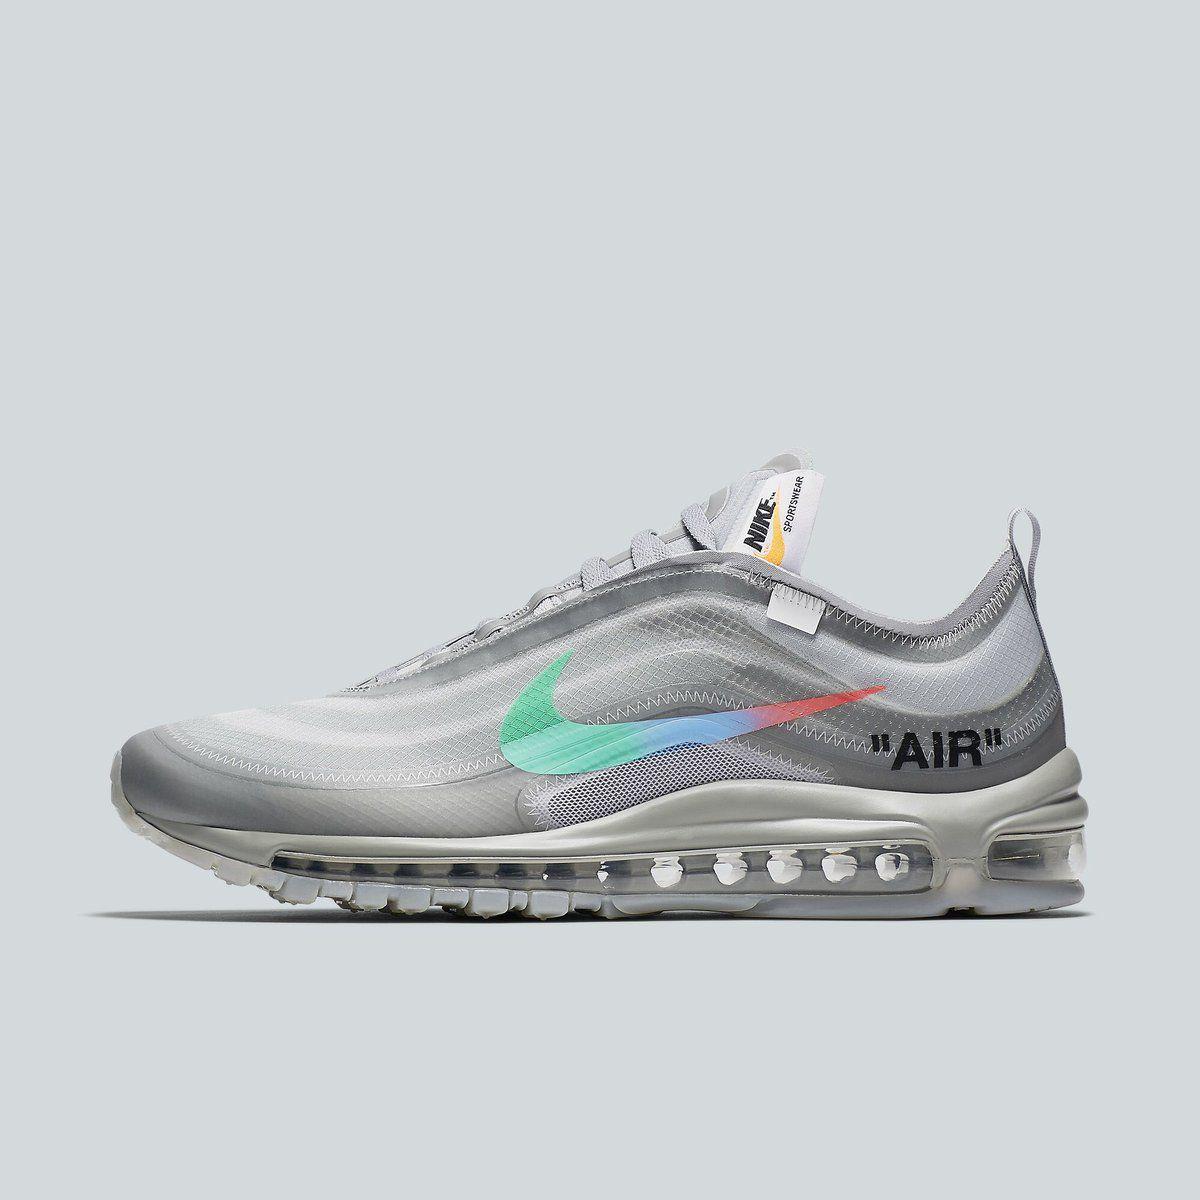 ffa067317e ปักพินโดย gft pnd ใน Shoes | Nike Air Max Nike และ Sneakers nike